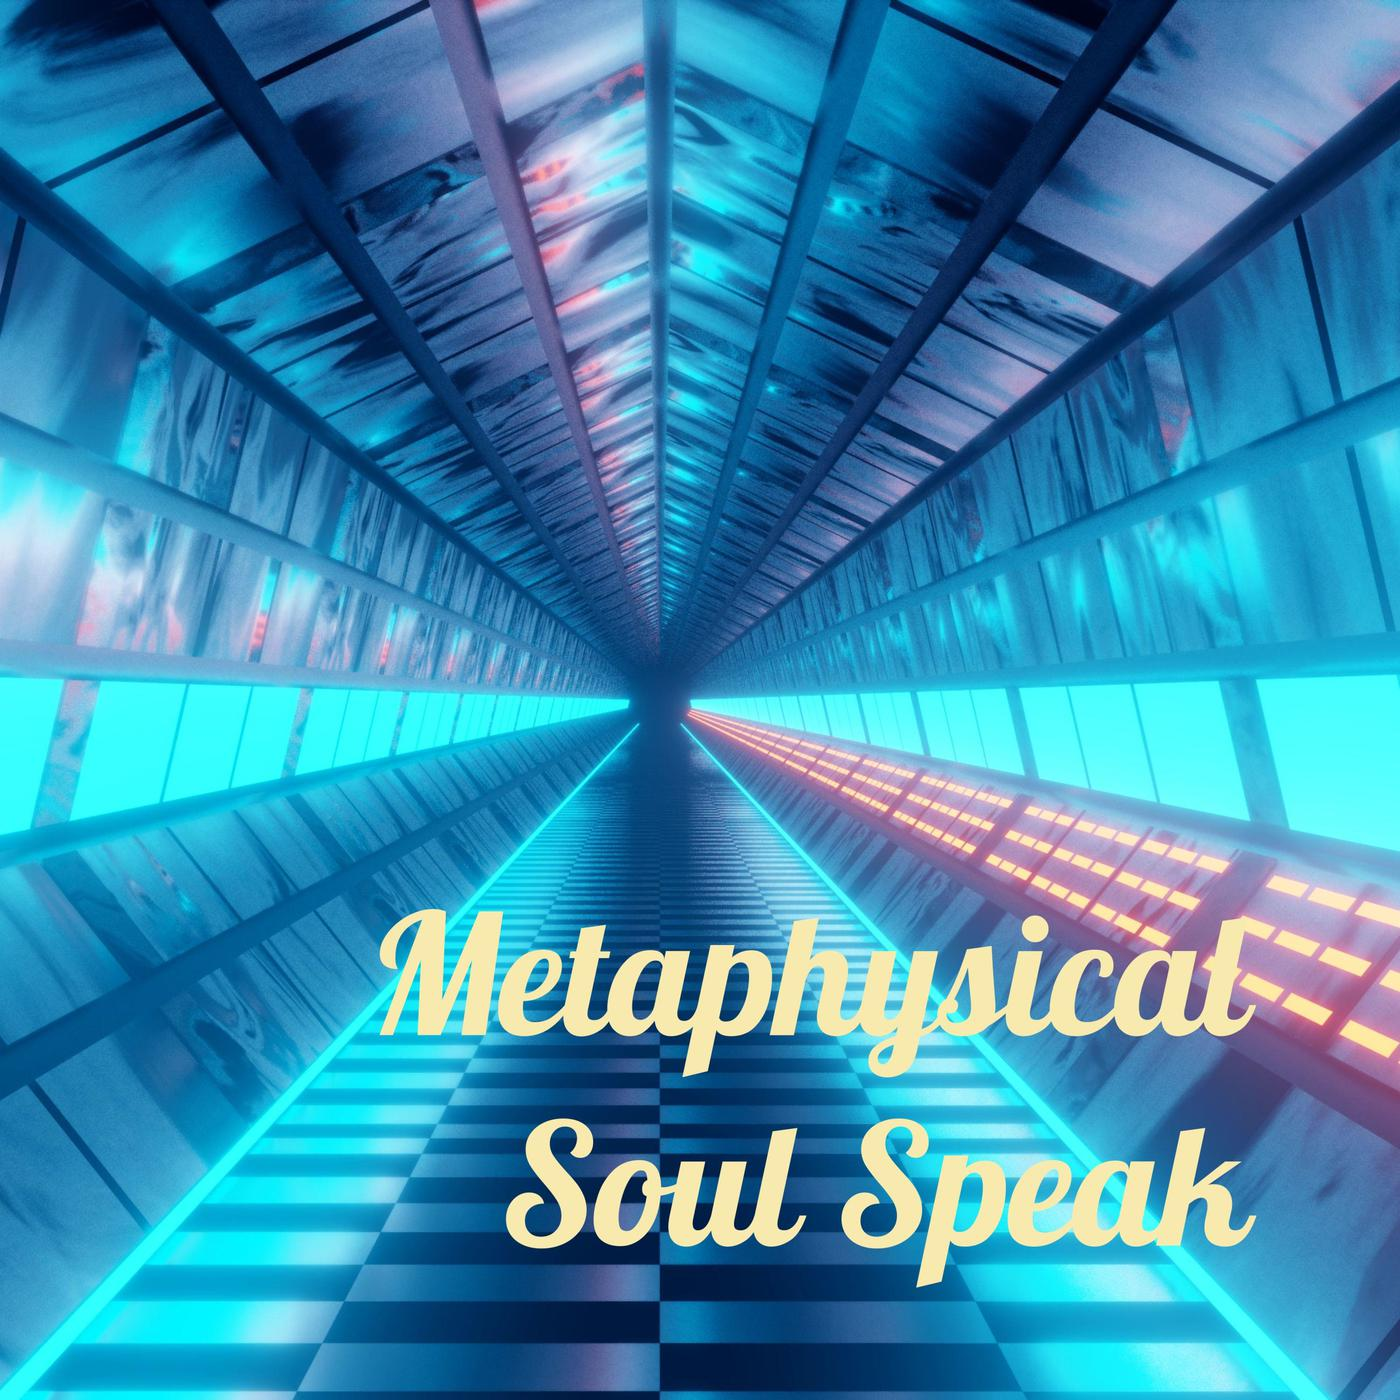 Metaphysical Soul Speak - - The Podcast! - Alanna Fox Starks